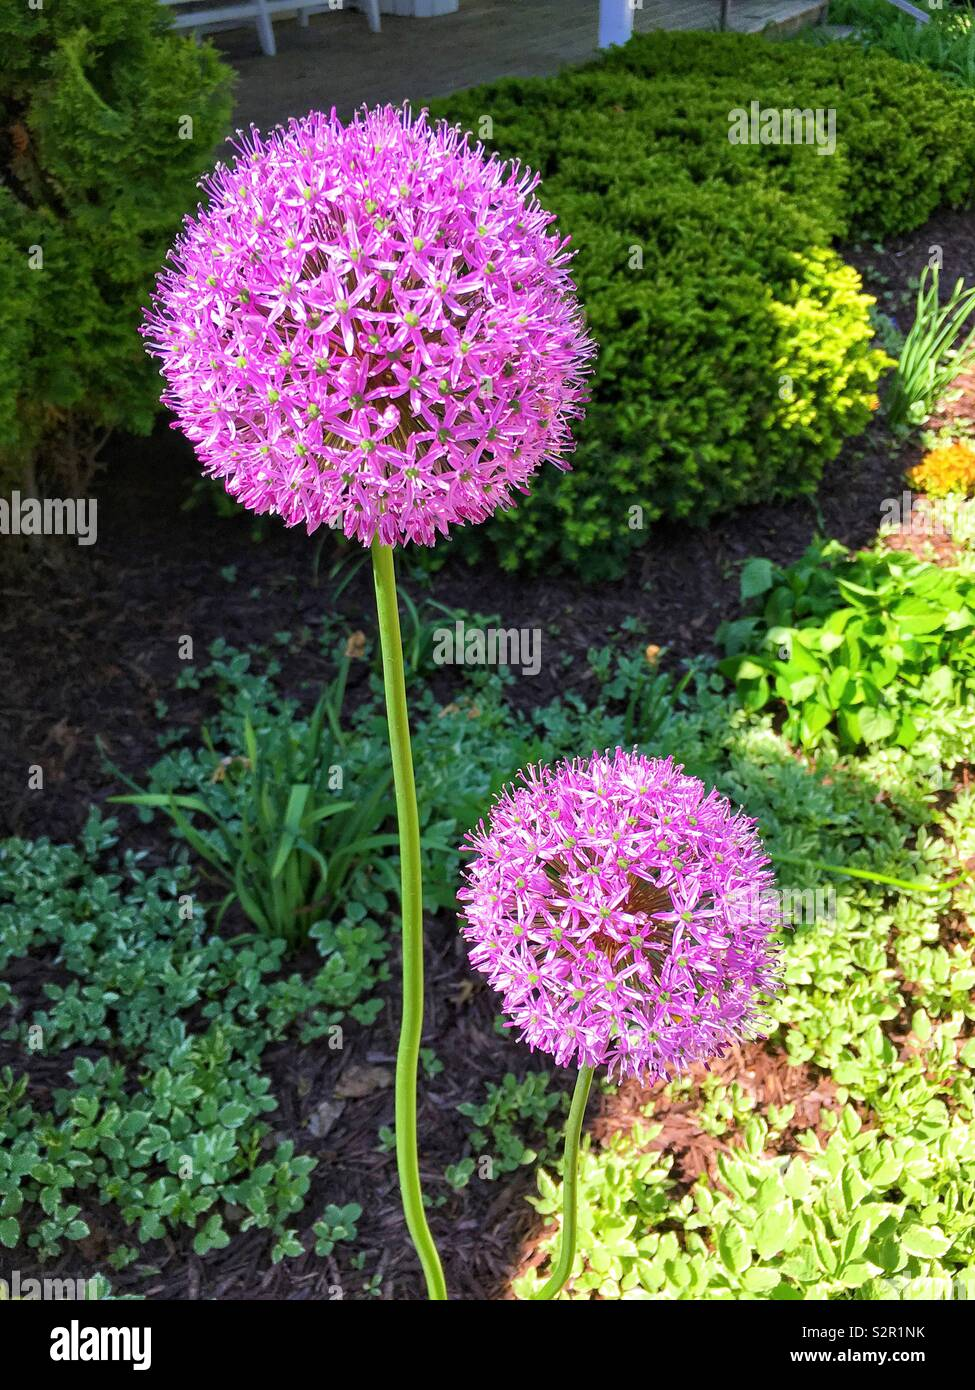 Purple giant allium flowers against greenery - Stock Image